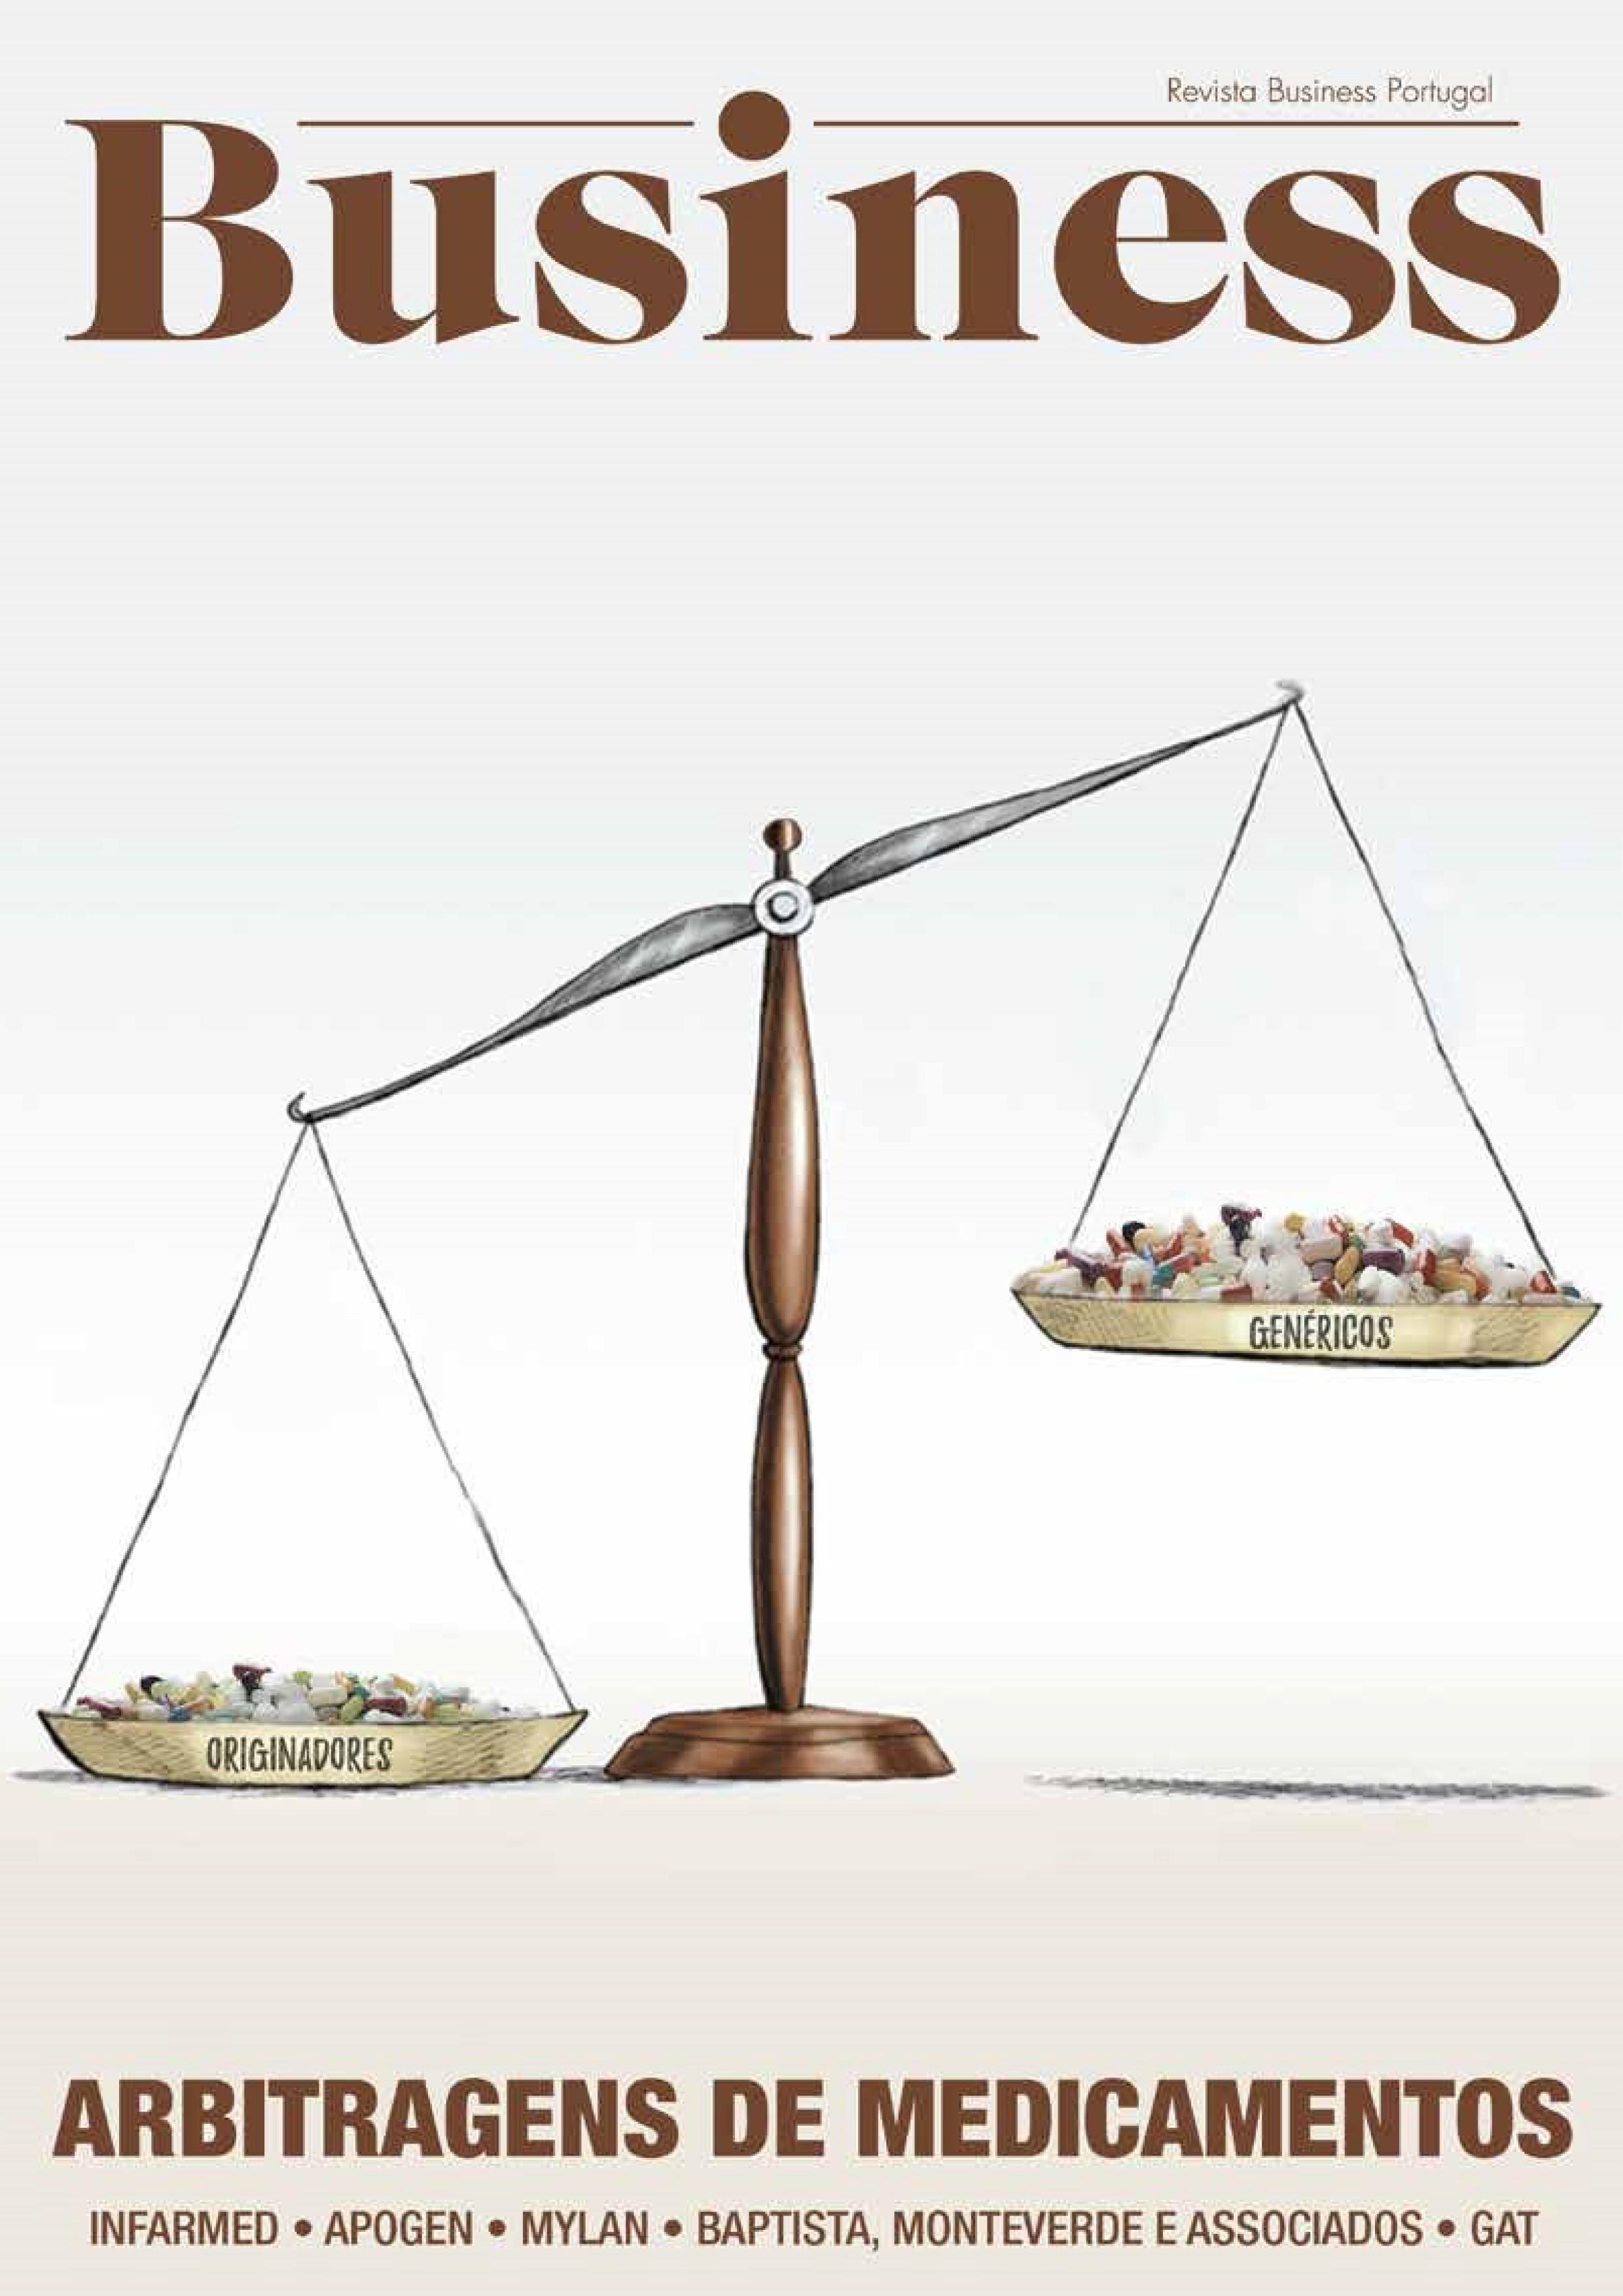 Arbitragens de Medicamentos